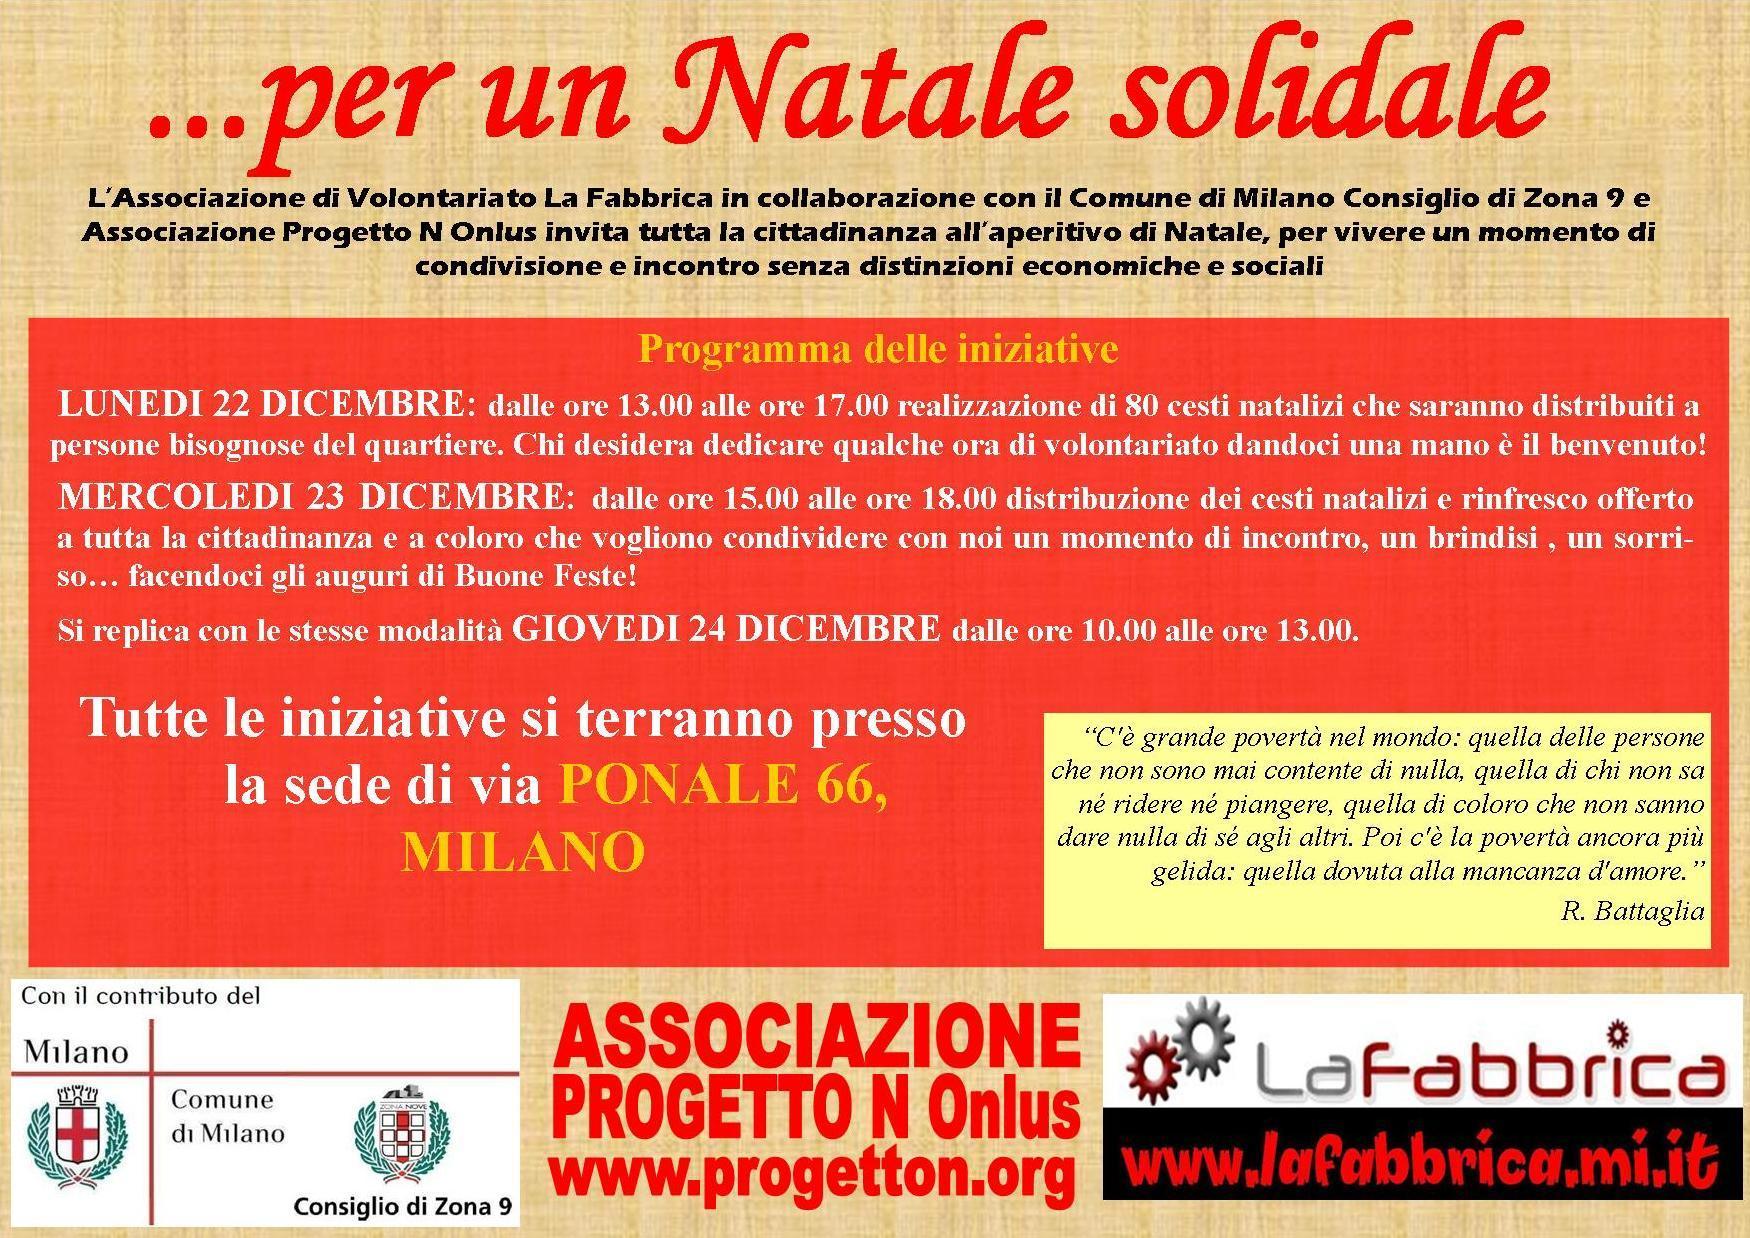 Nataler Solidale LaFabbrica